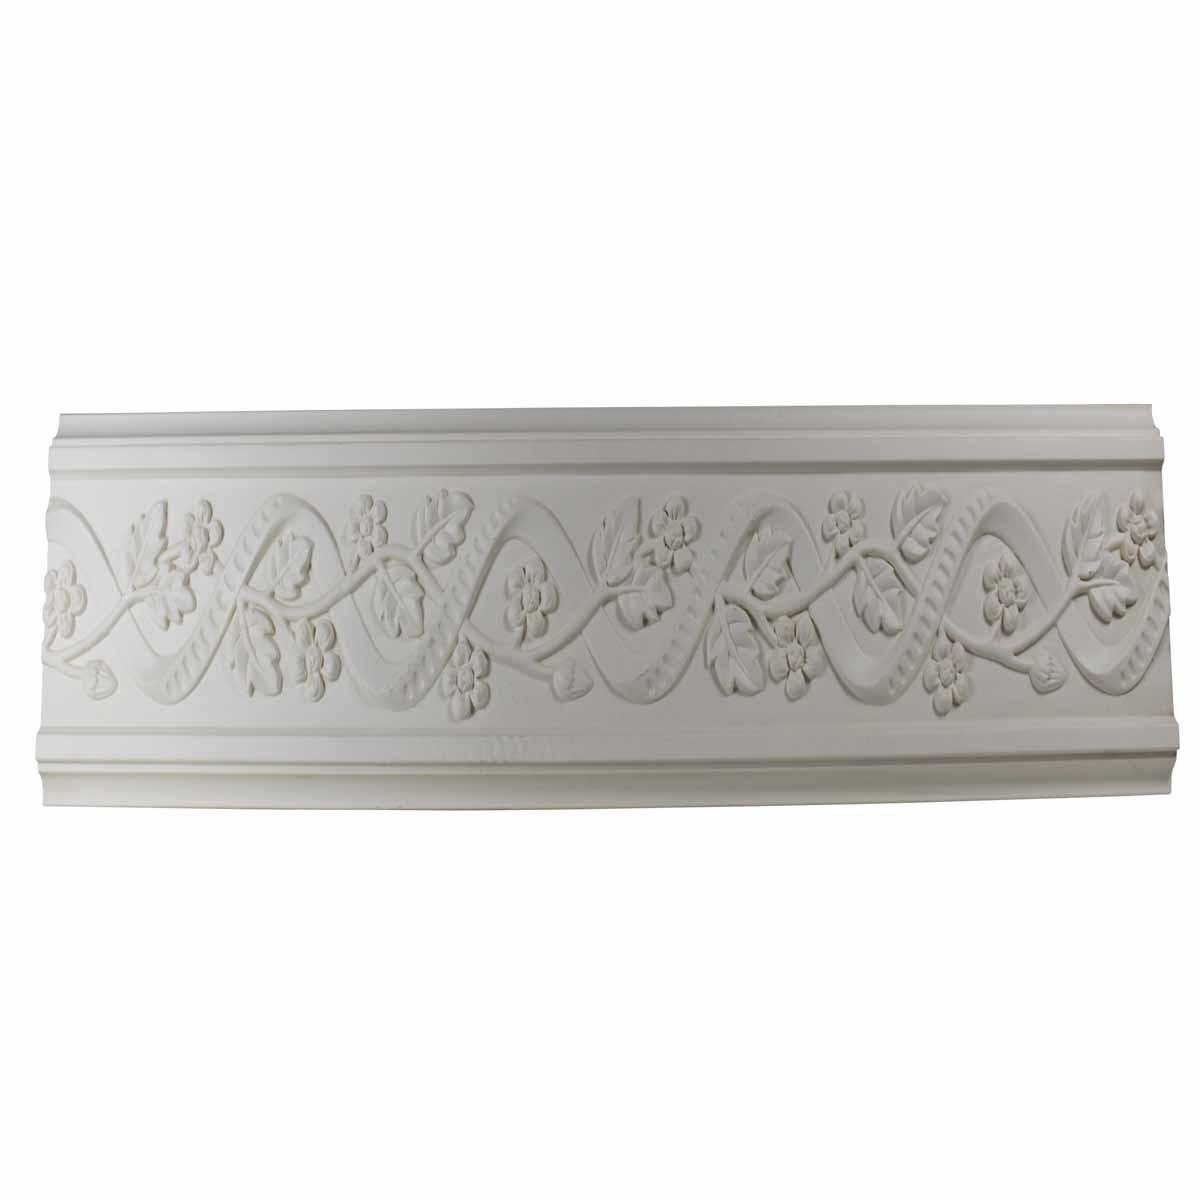 Cornice White Urethane Sample of 11630 24 Long Cornice Cornice Moulding Cornice Molding